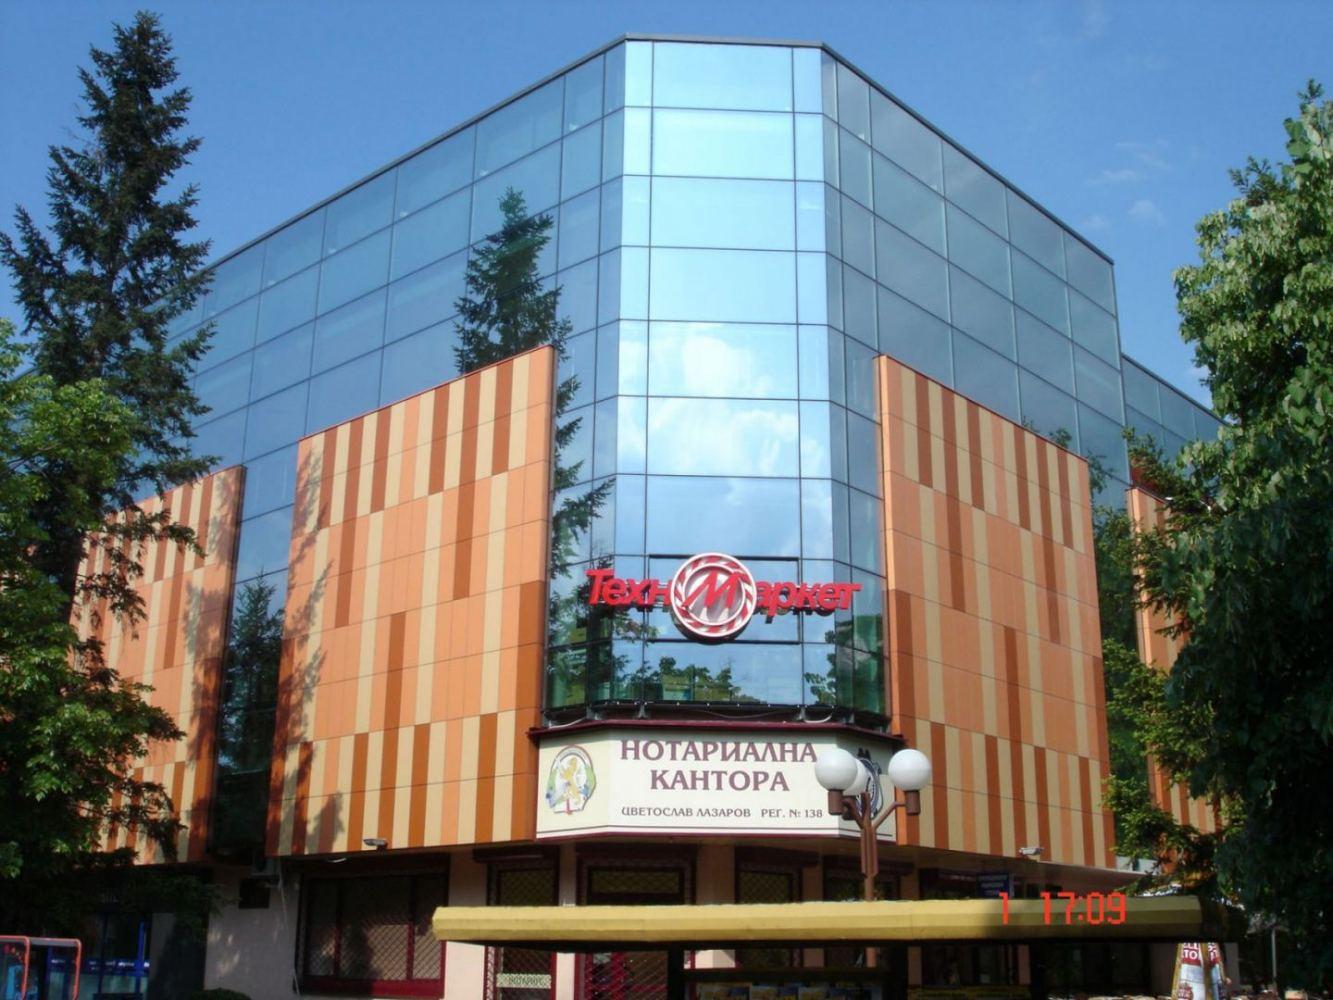 Sity Center - Lovech (3)